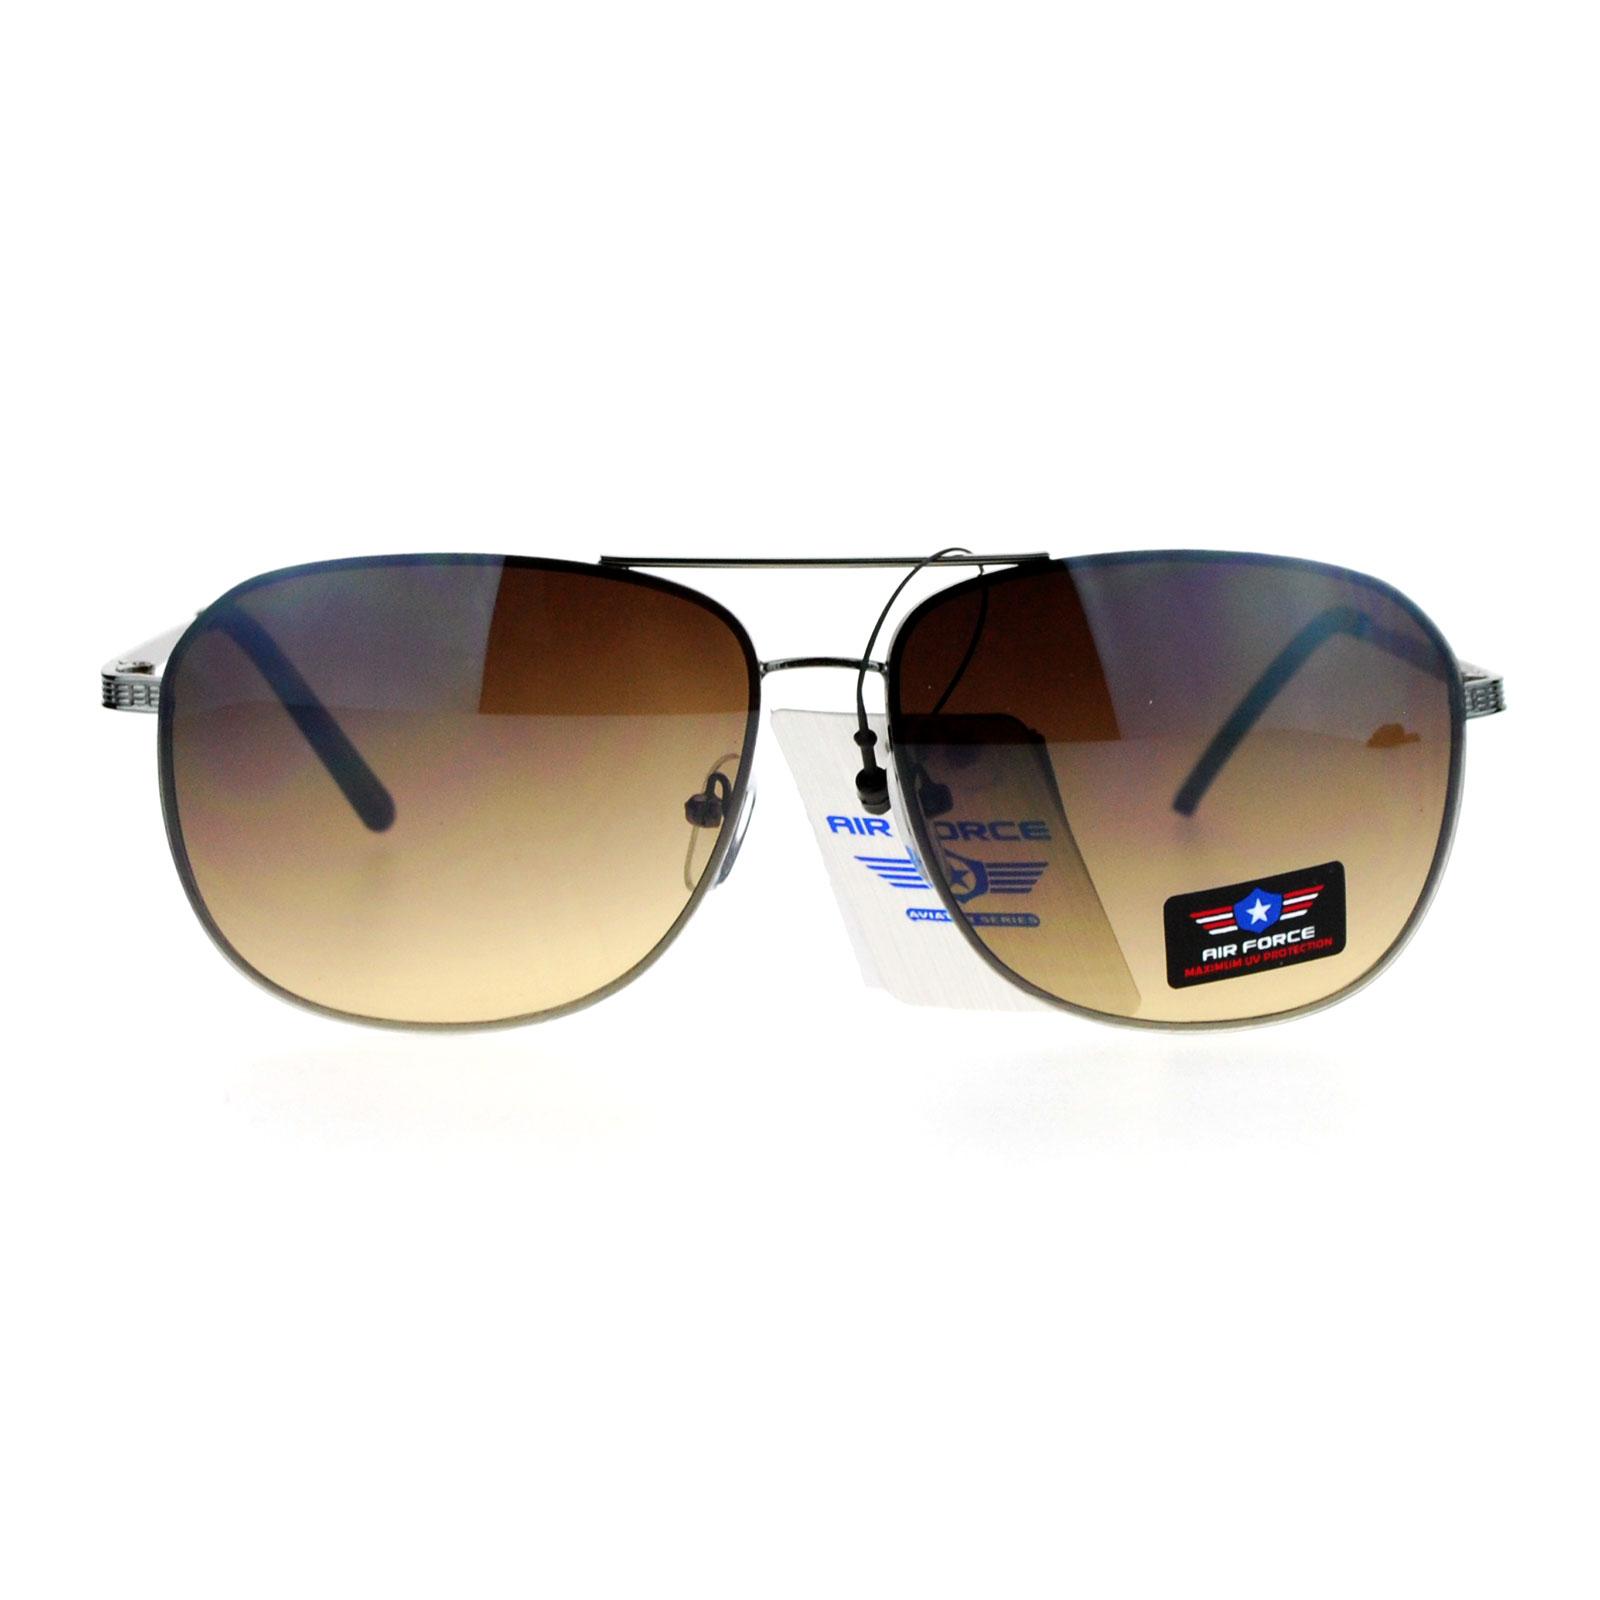 SA106 Air Force Mens Mirrored Rimless Aviator Sunglasses ...